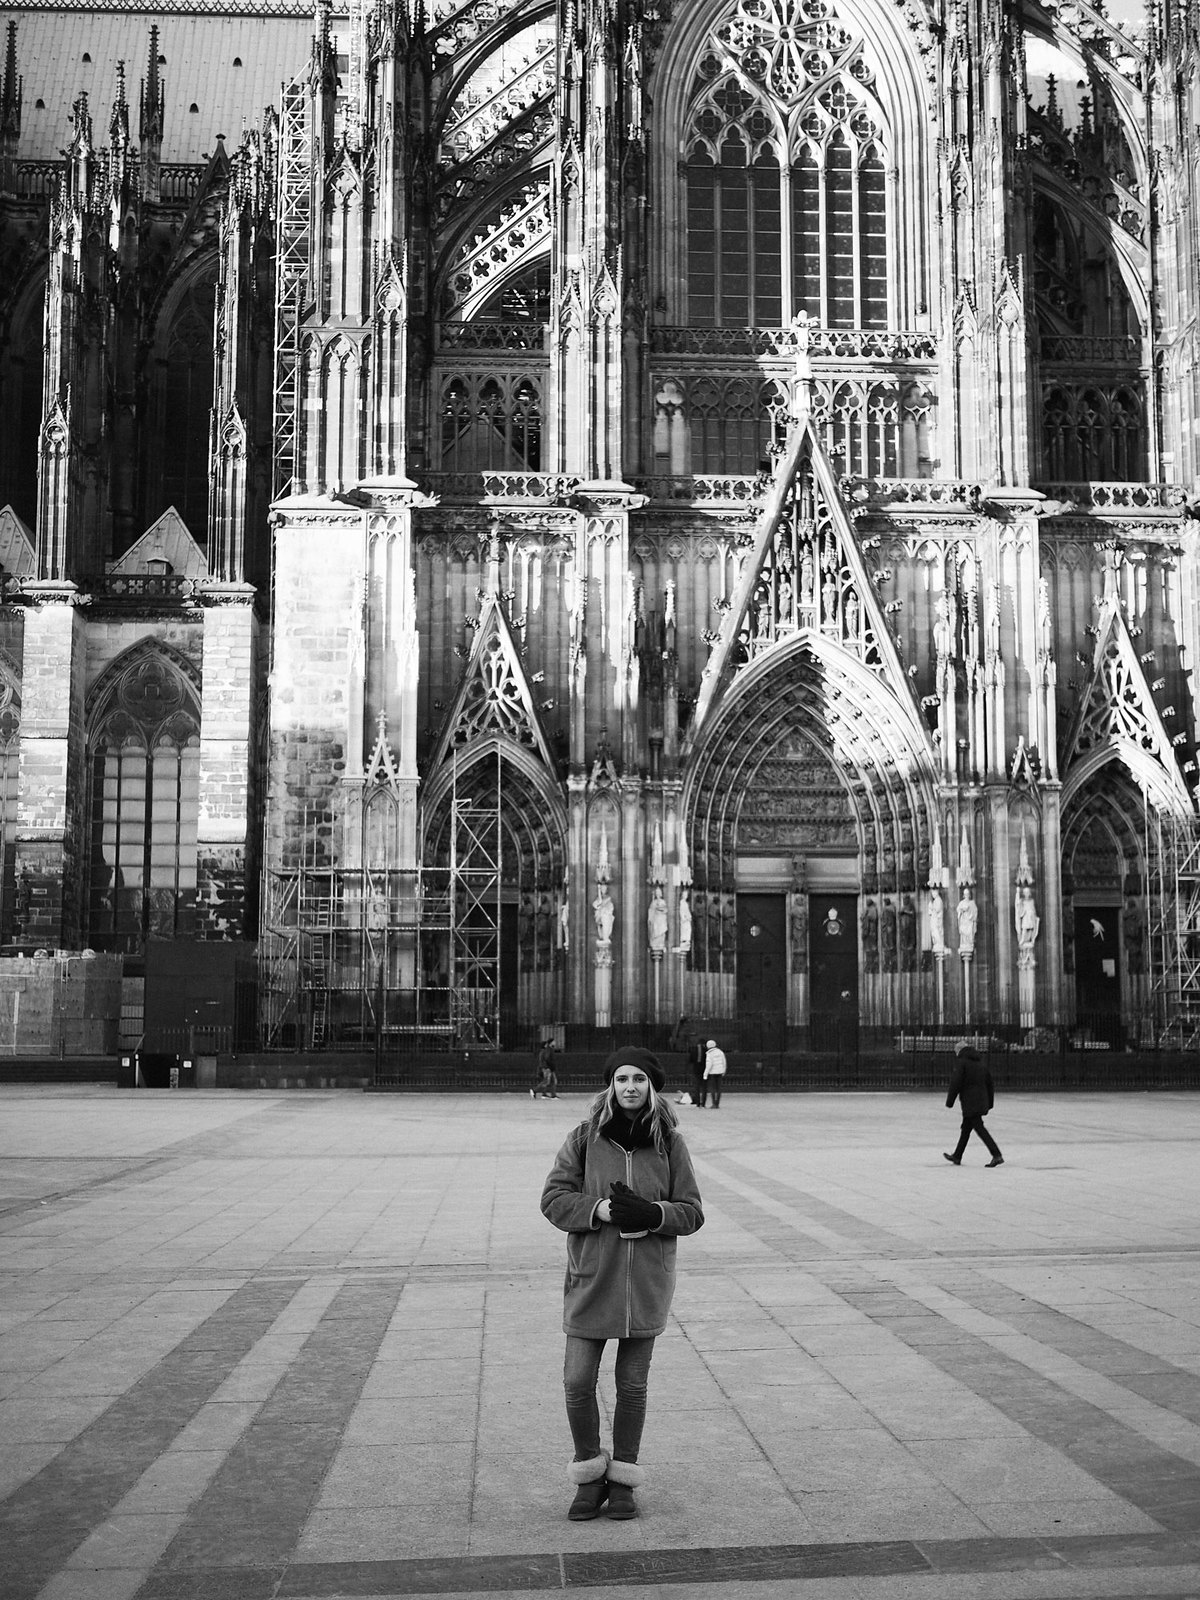 cathédrale-cologne-2.jpg